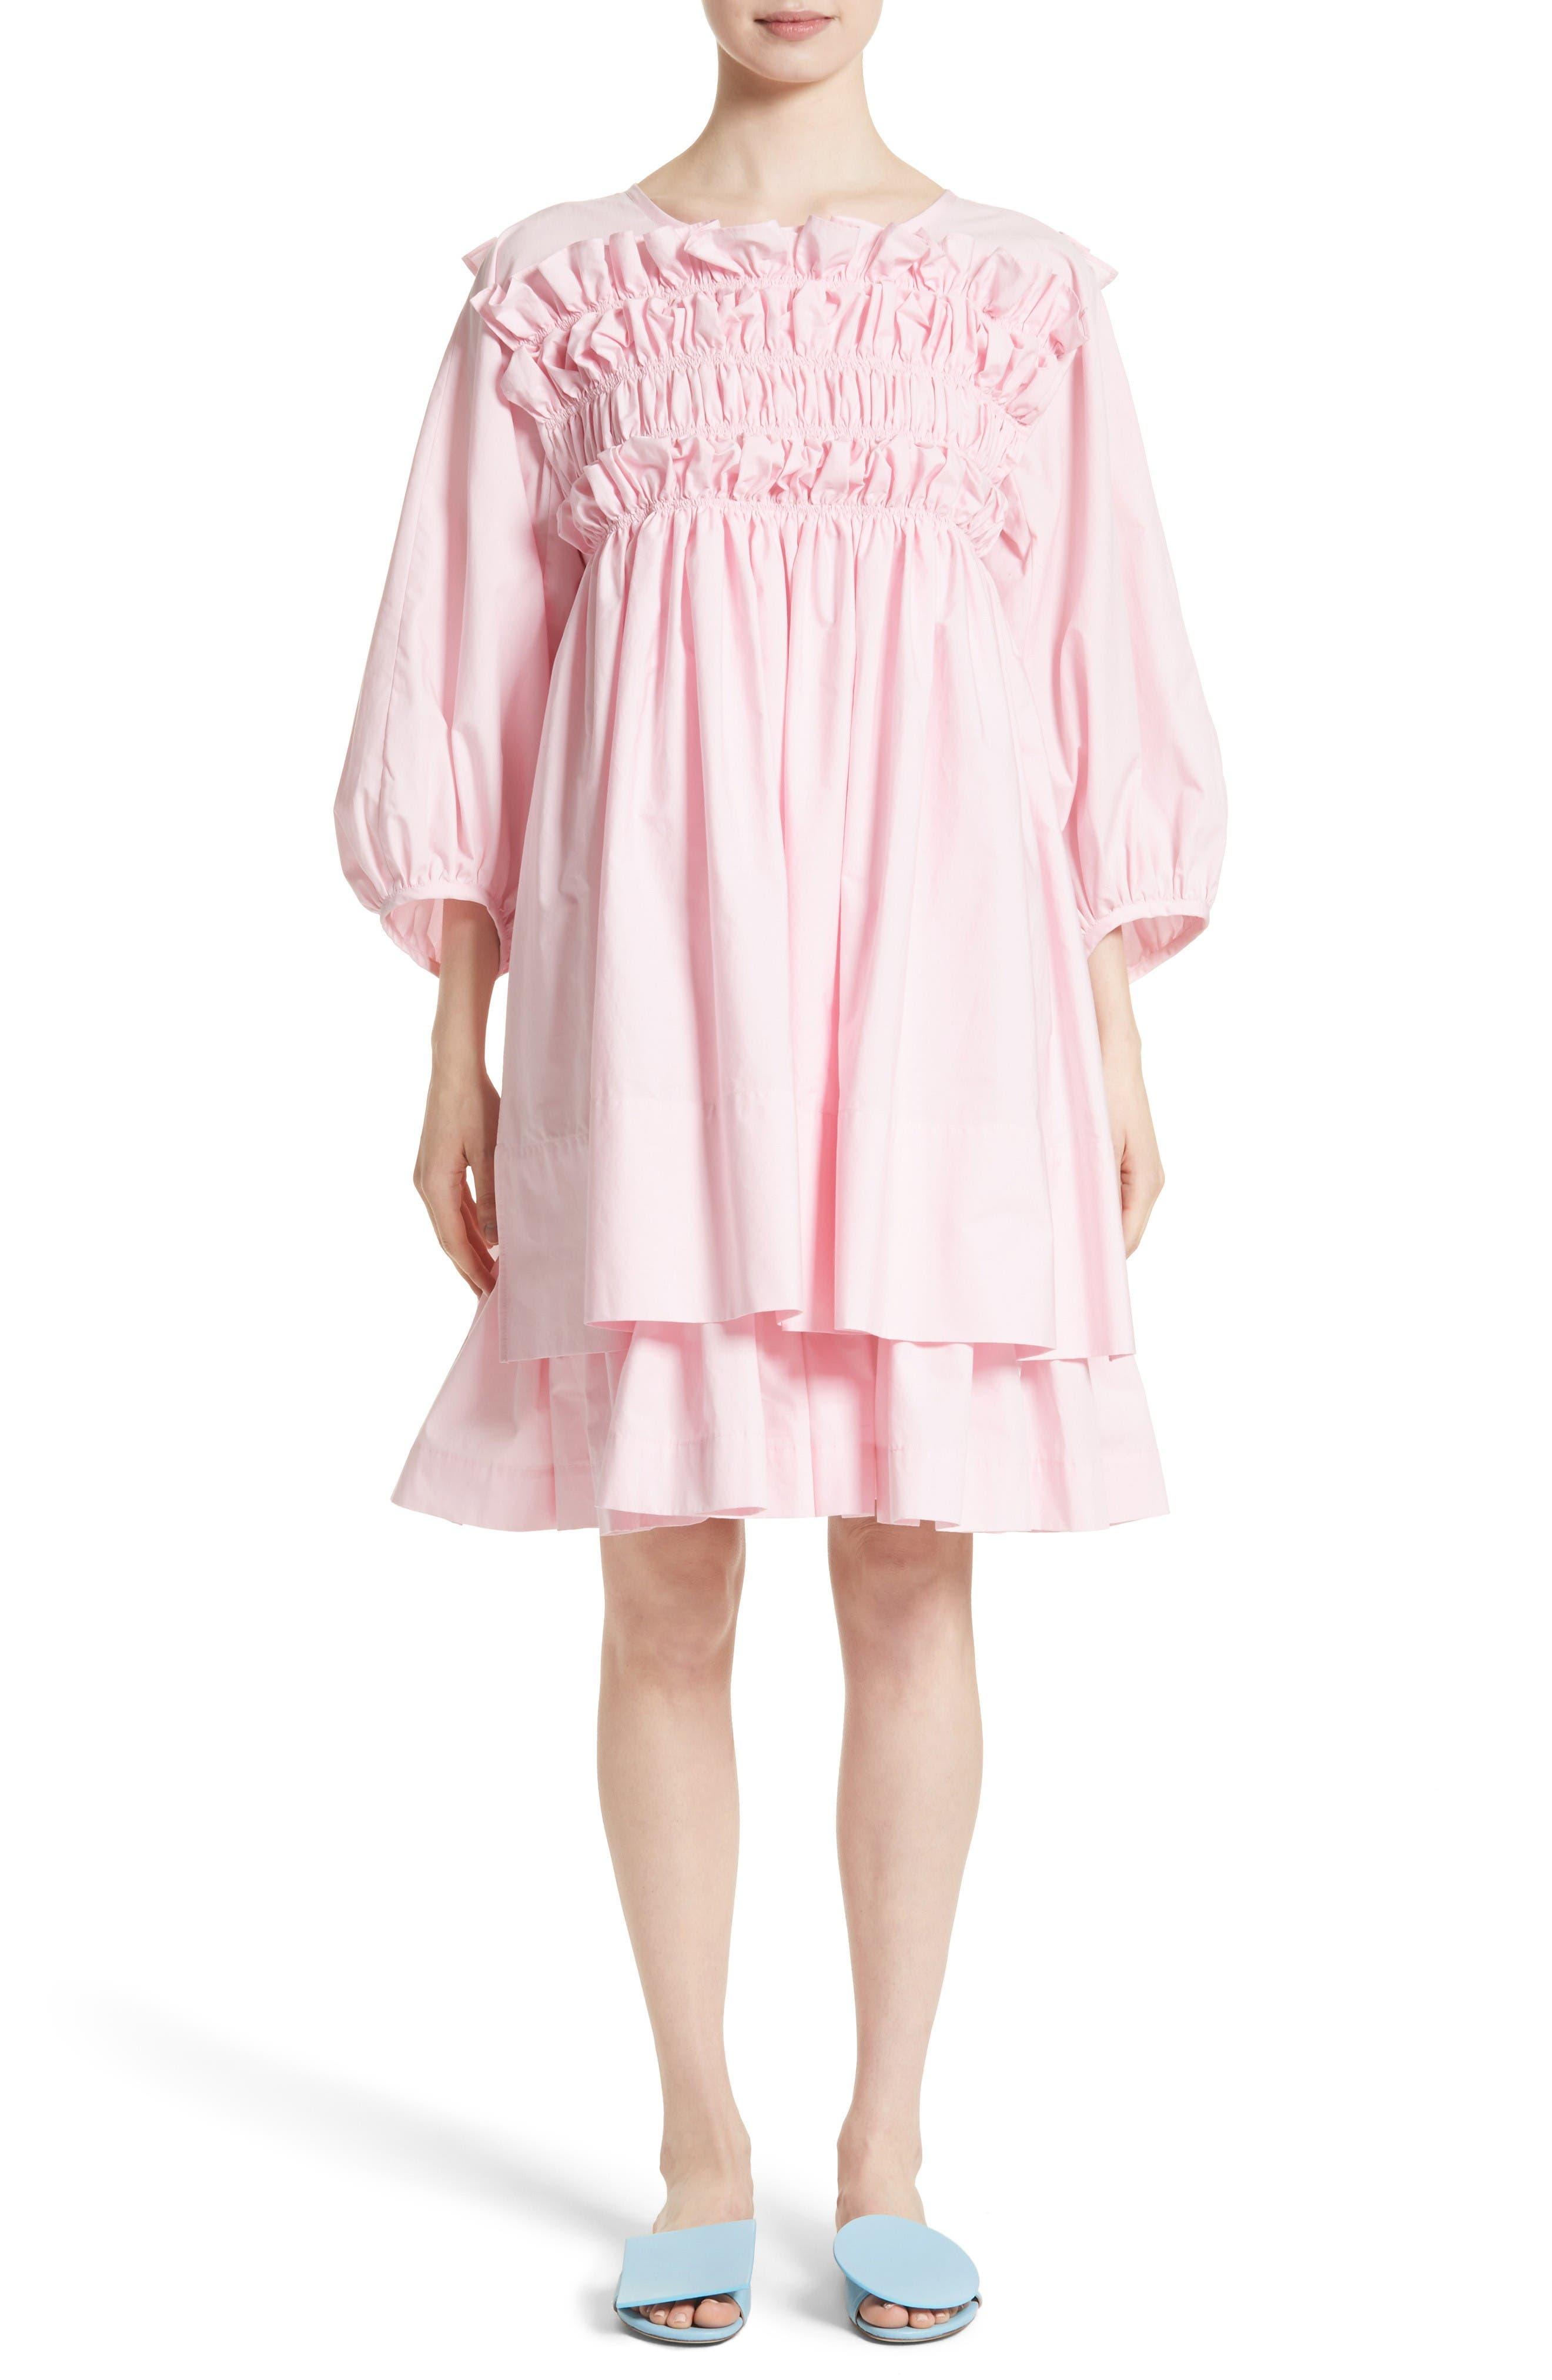 Molly Goddard Smocked Frill Dress (Nordstrom Exclusive)